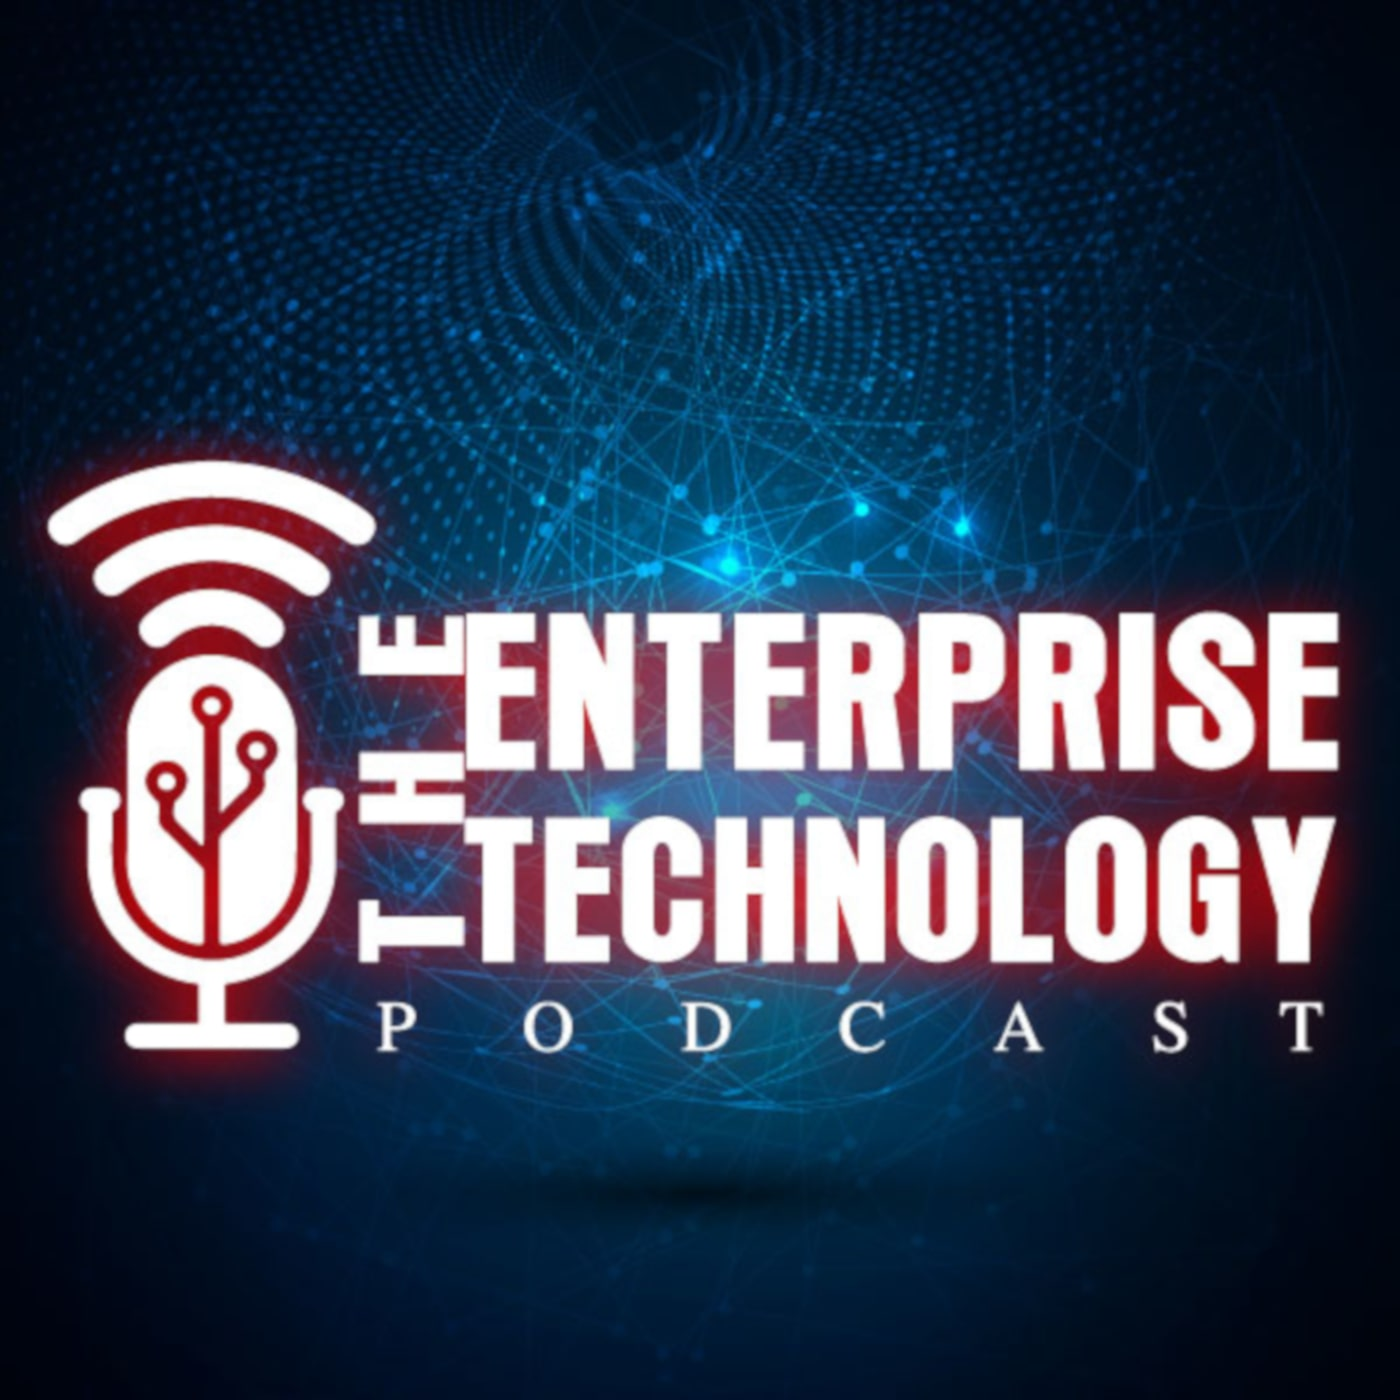 The Enterprise Technology Podcast show art